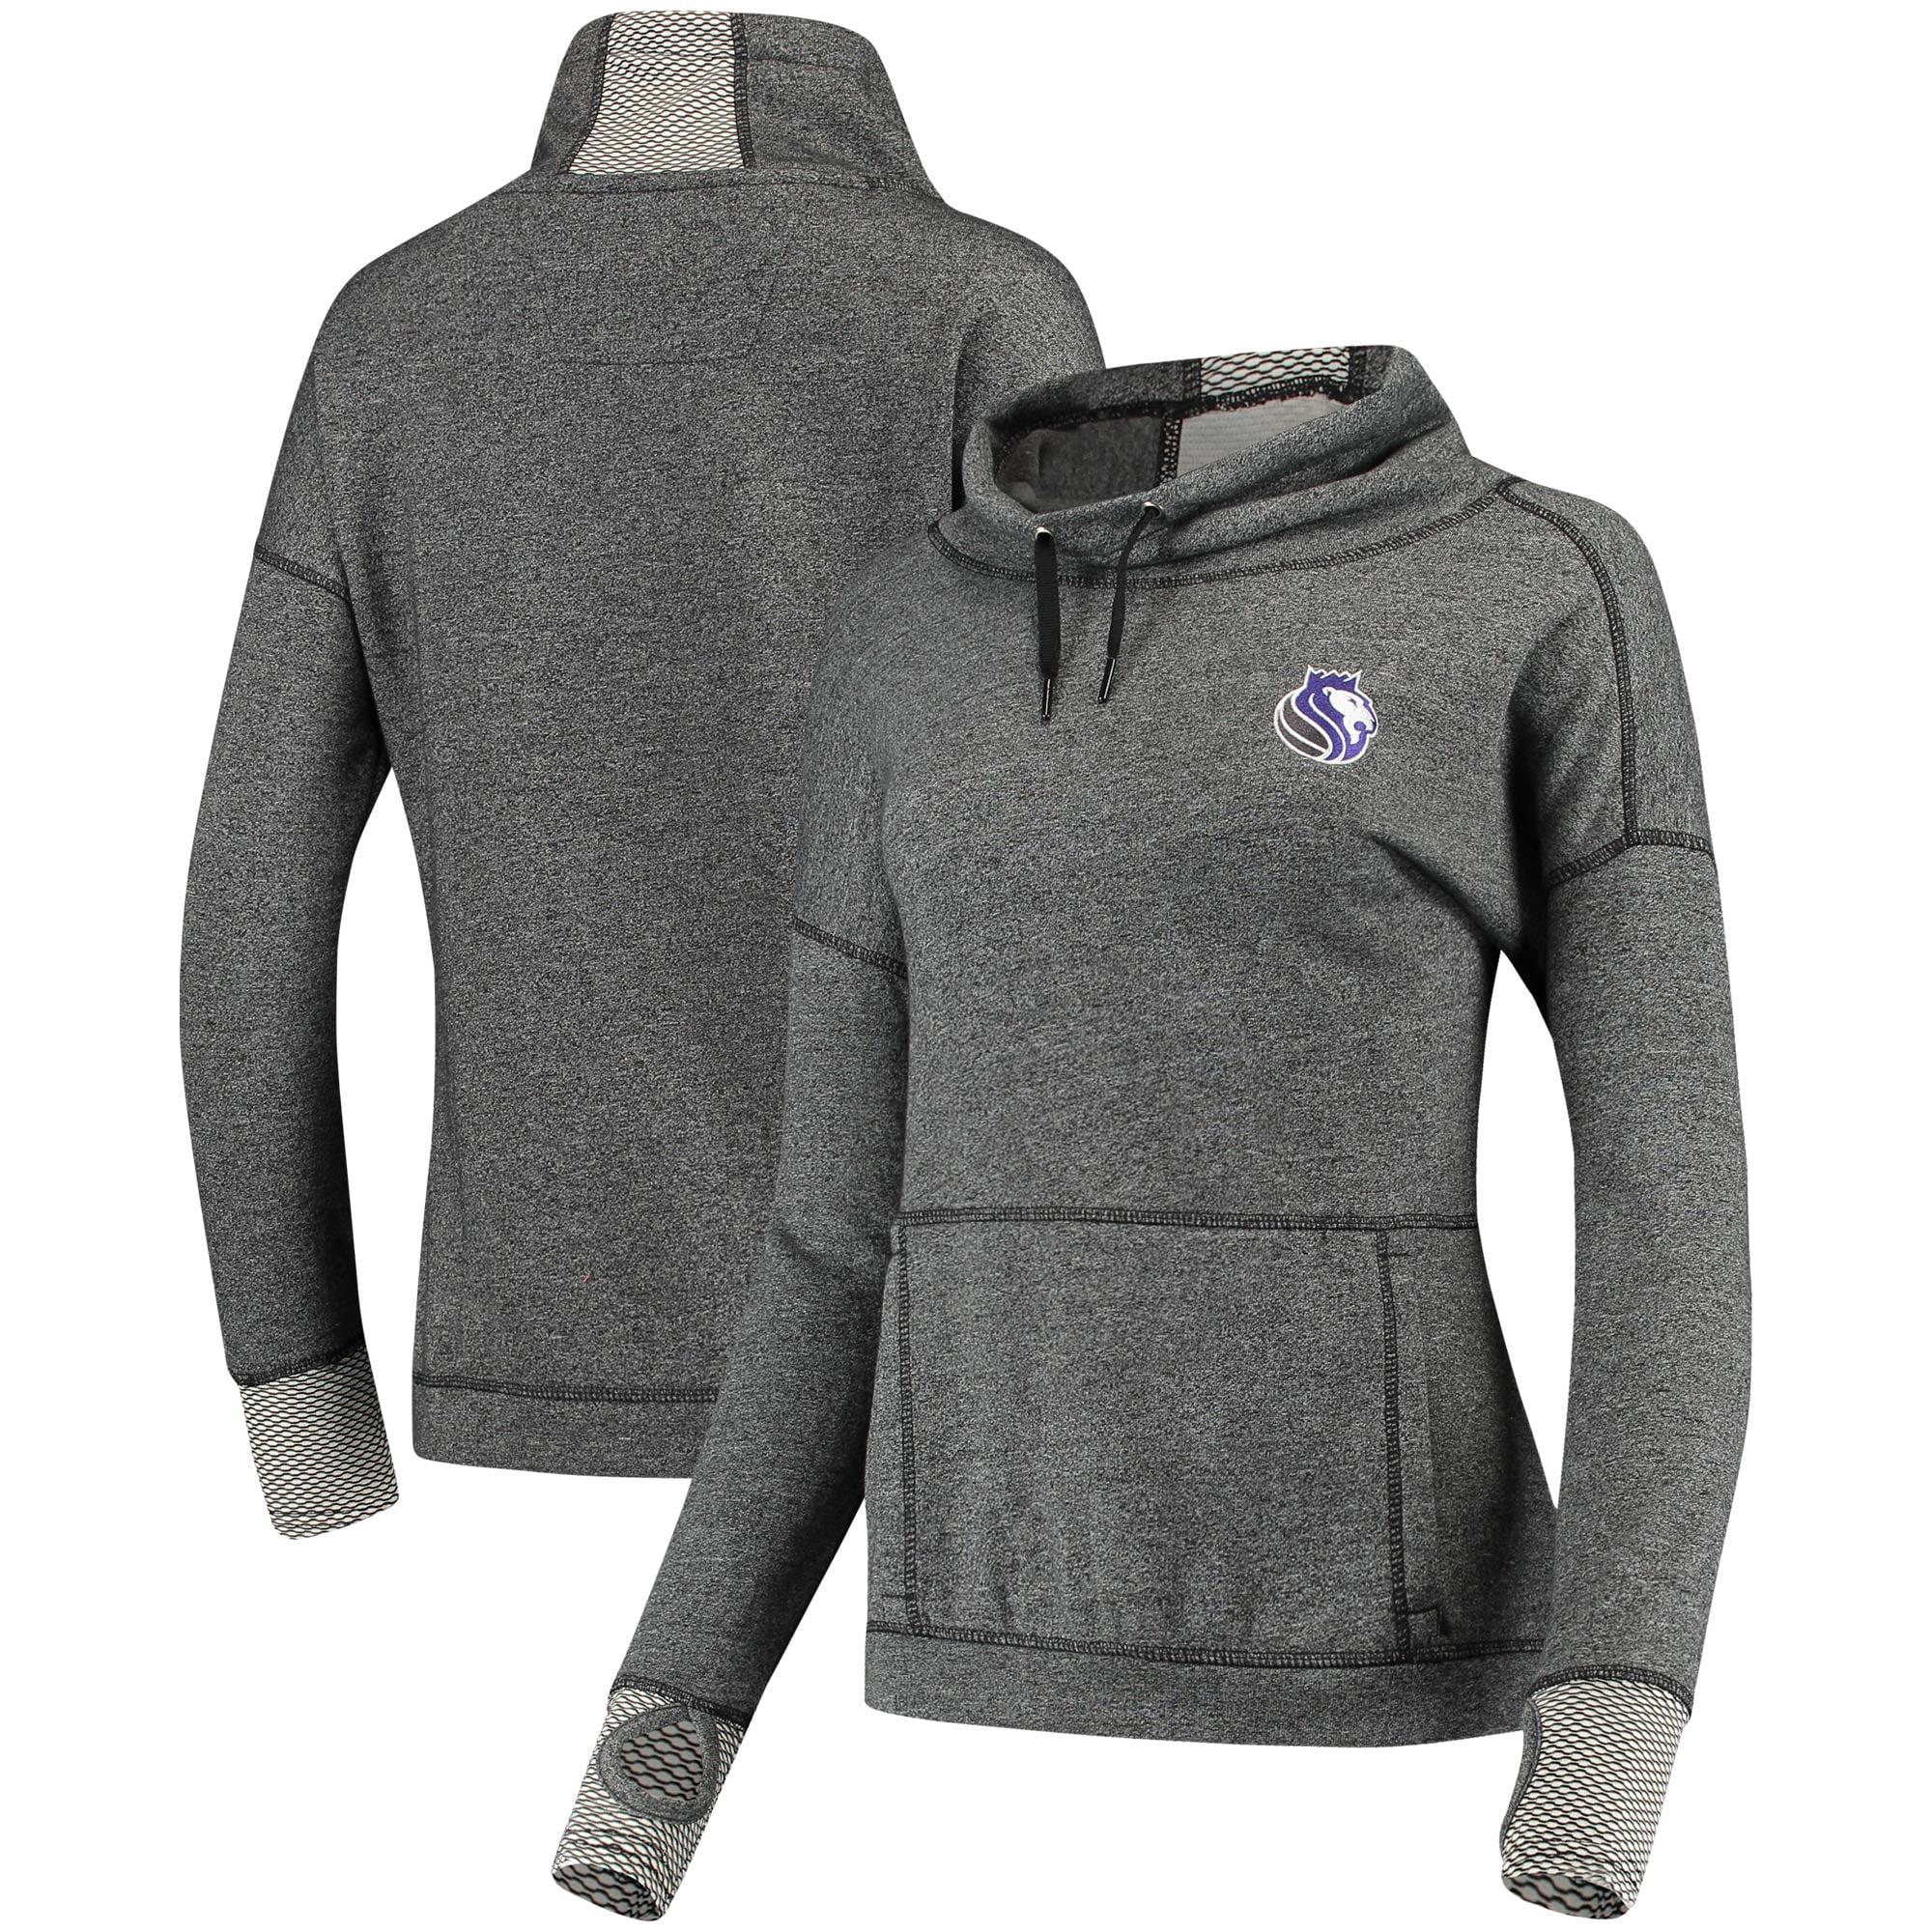 Sacramento Kings Antigua Women's Snap Cowl Neck Pullover Sweatshirt - Heathered Black